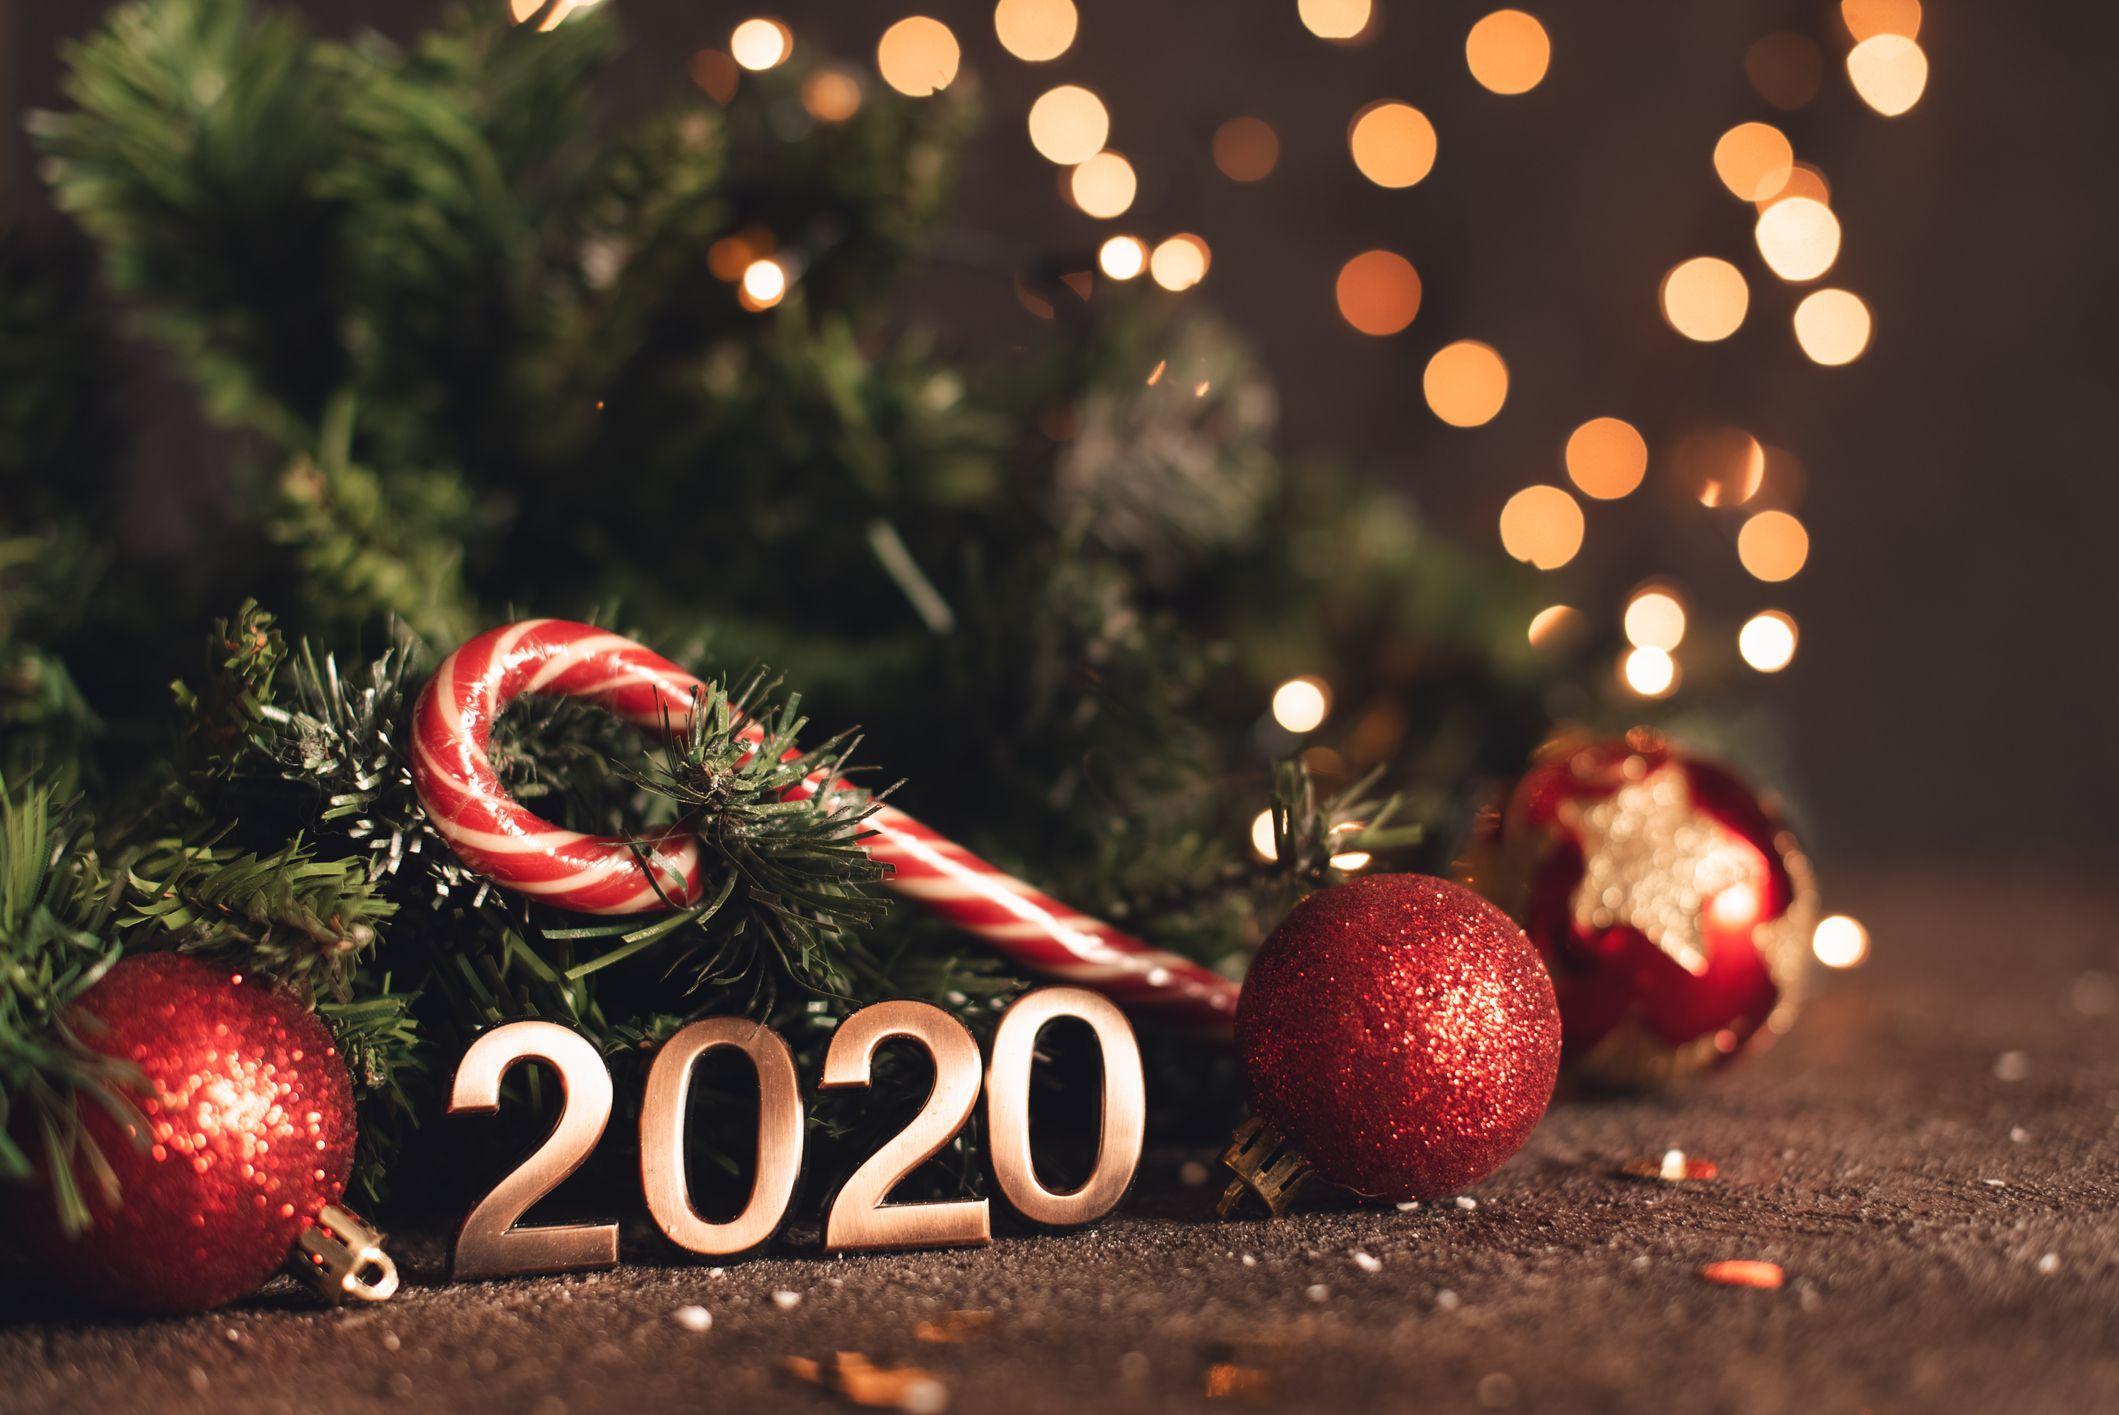 Christmas Eve 2021 Federal Is Christmas Eve 2020 A Federal Holiday Is Christmas Eve A Legal Holiday This Year